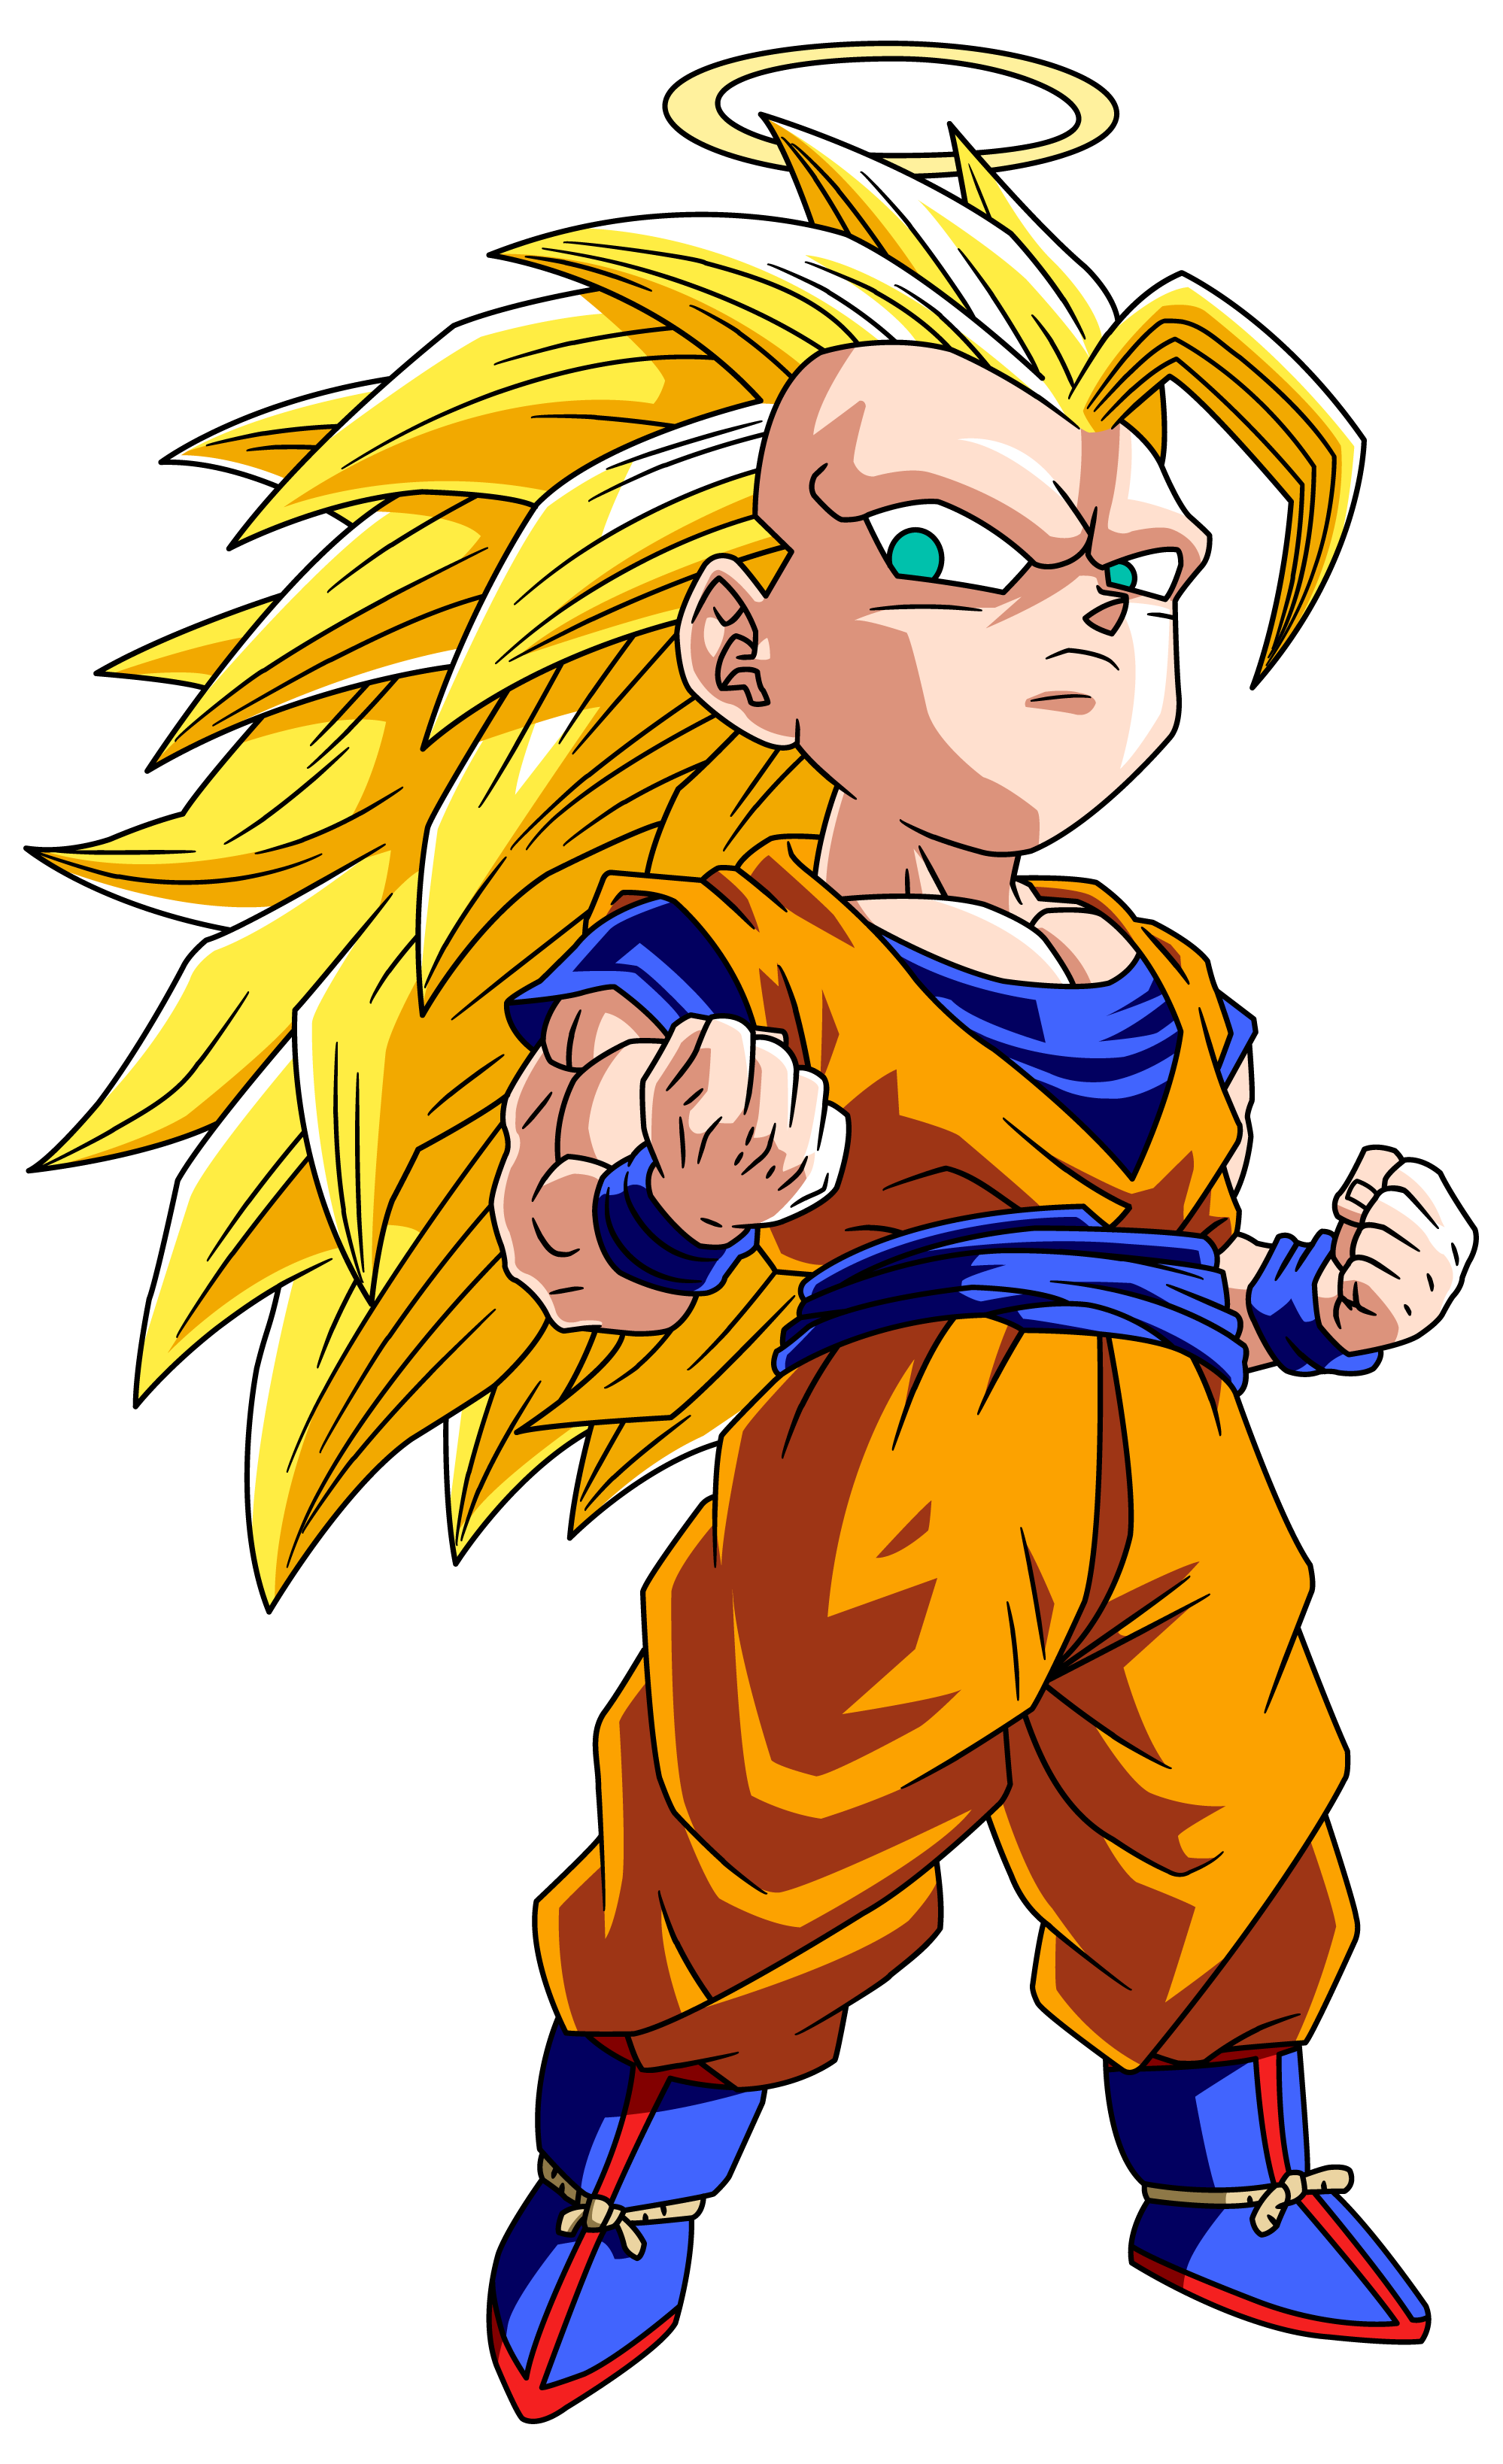 Cute Little Super Saiyan 3 Goku 3 Visit Now For 3d Dragon Ball Z Shirts Now On Sale Chibi Dragon Chibi Goku Dragon Ball Goku